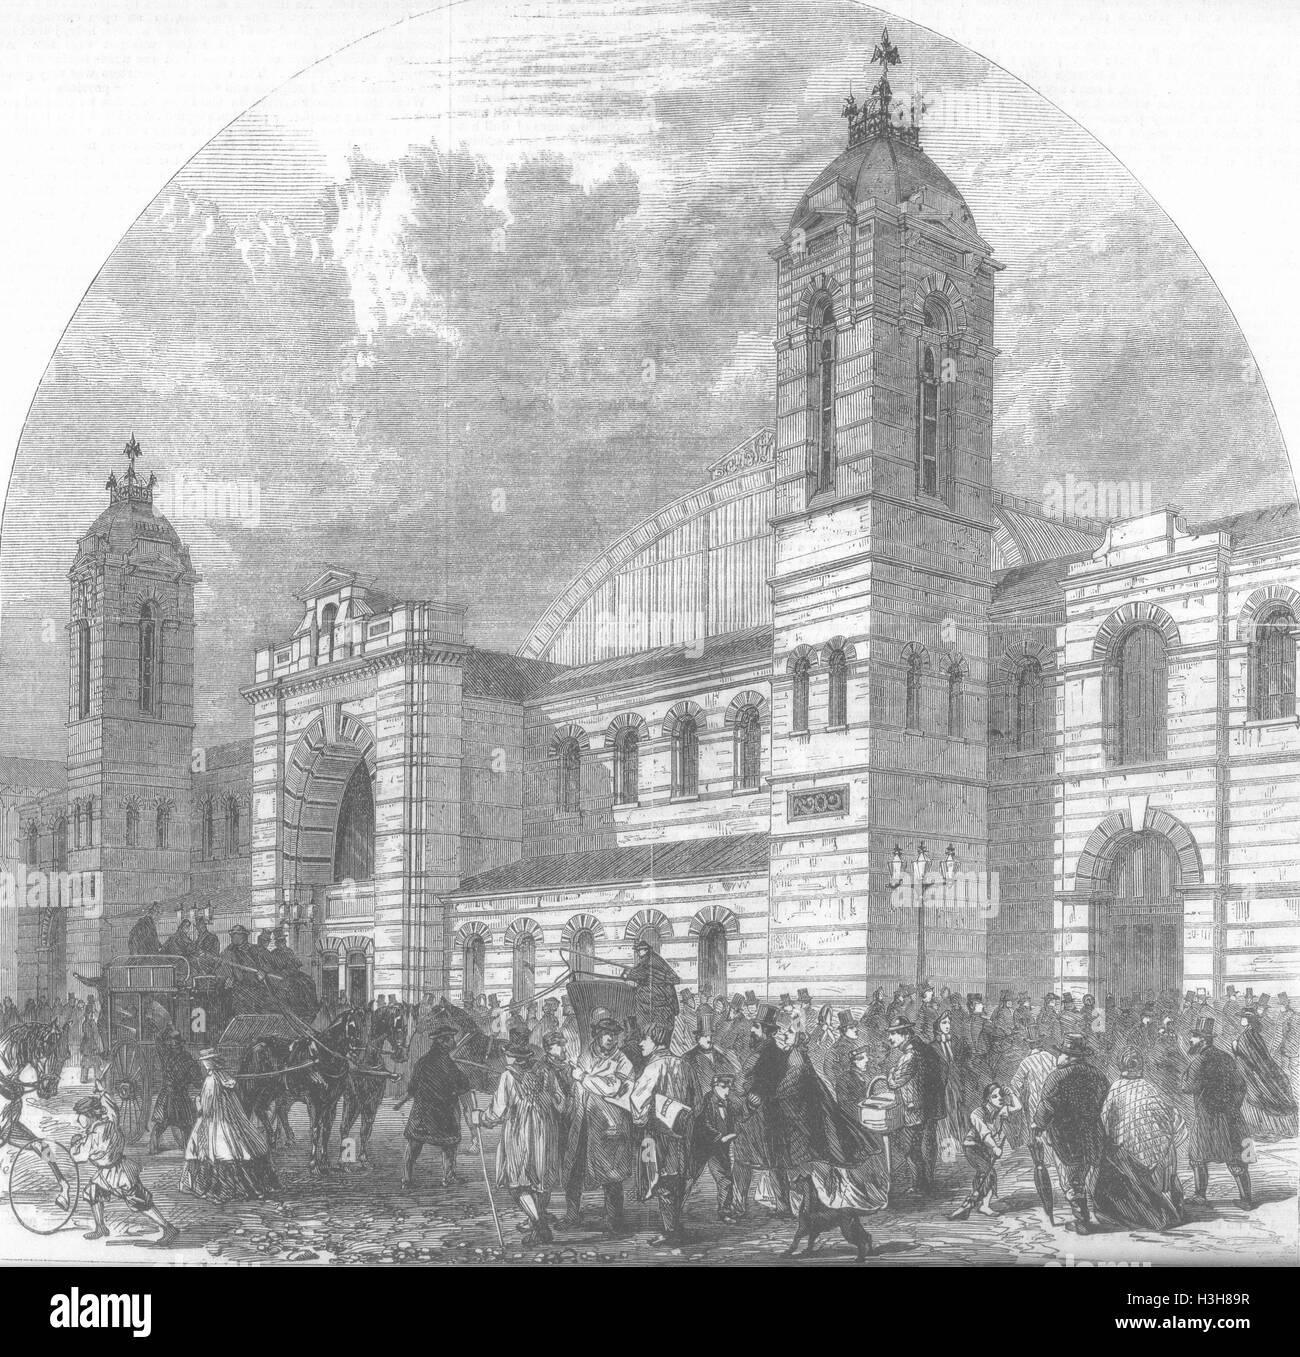 LONDON Smithfield Cattle Show, Islington 1862. Illustrated Times - Stock Image